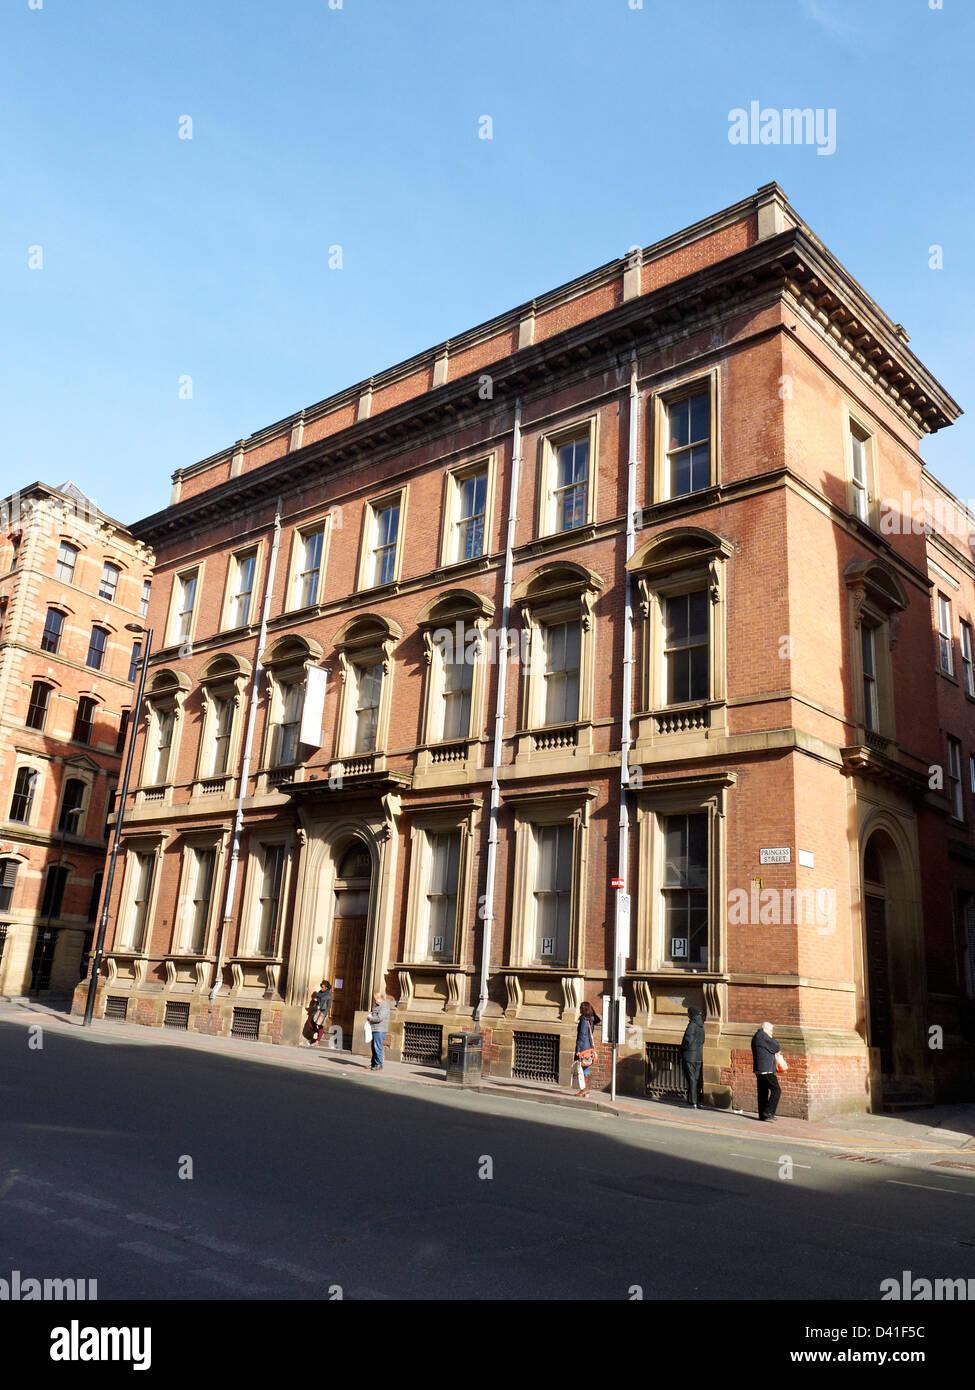 103 Princess Street in Manchester UK - Stock Image